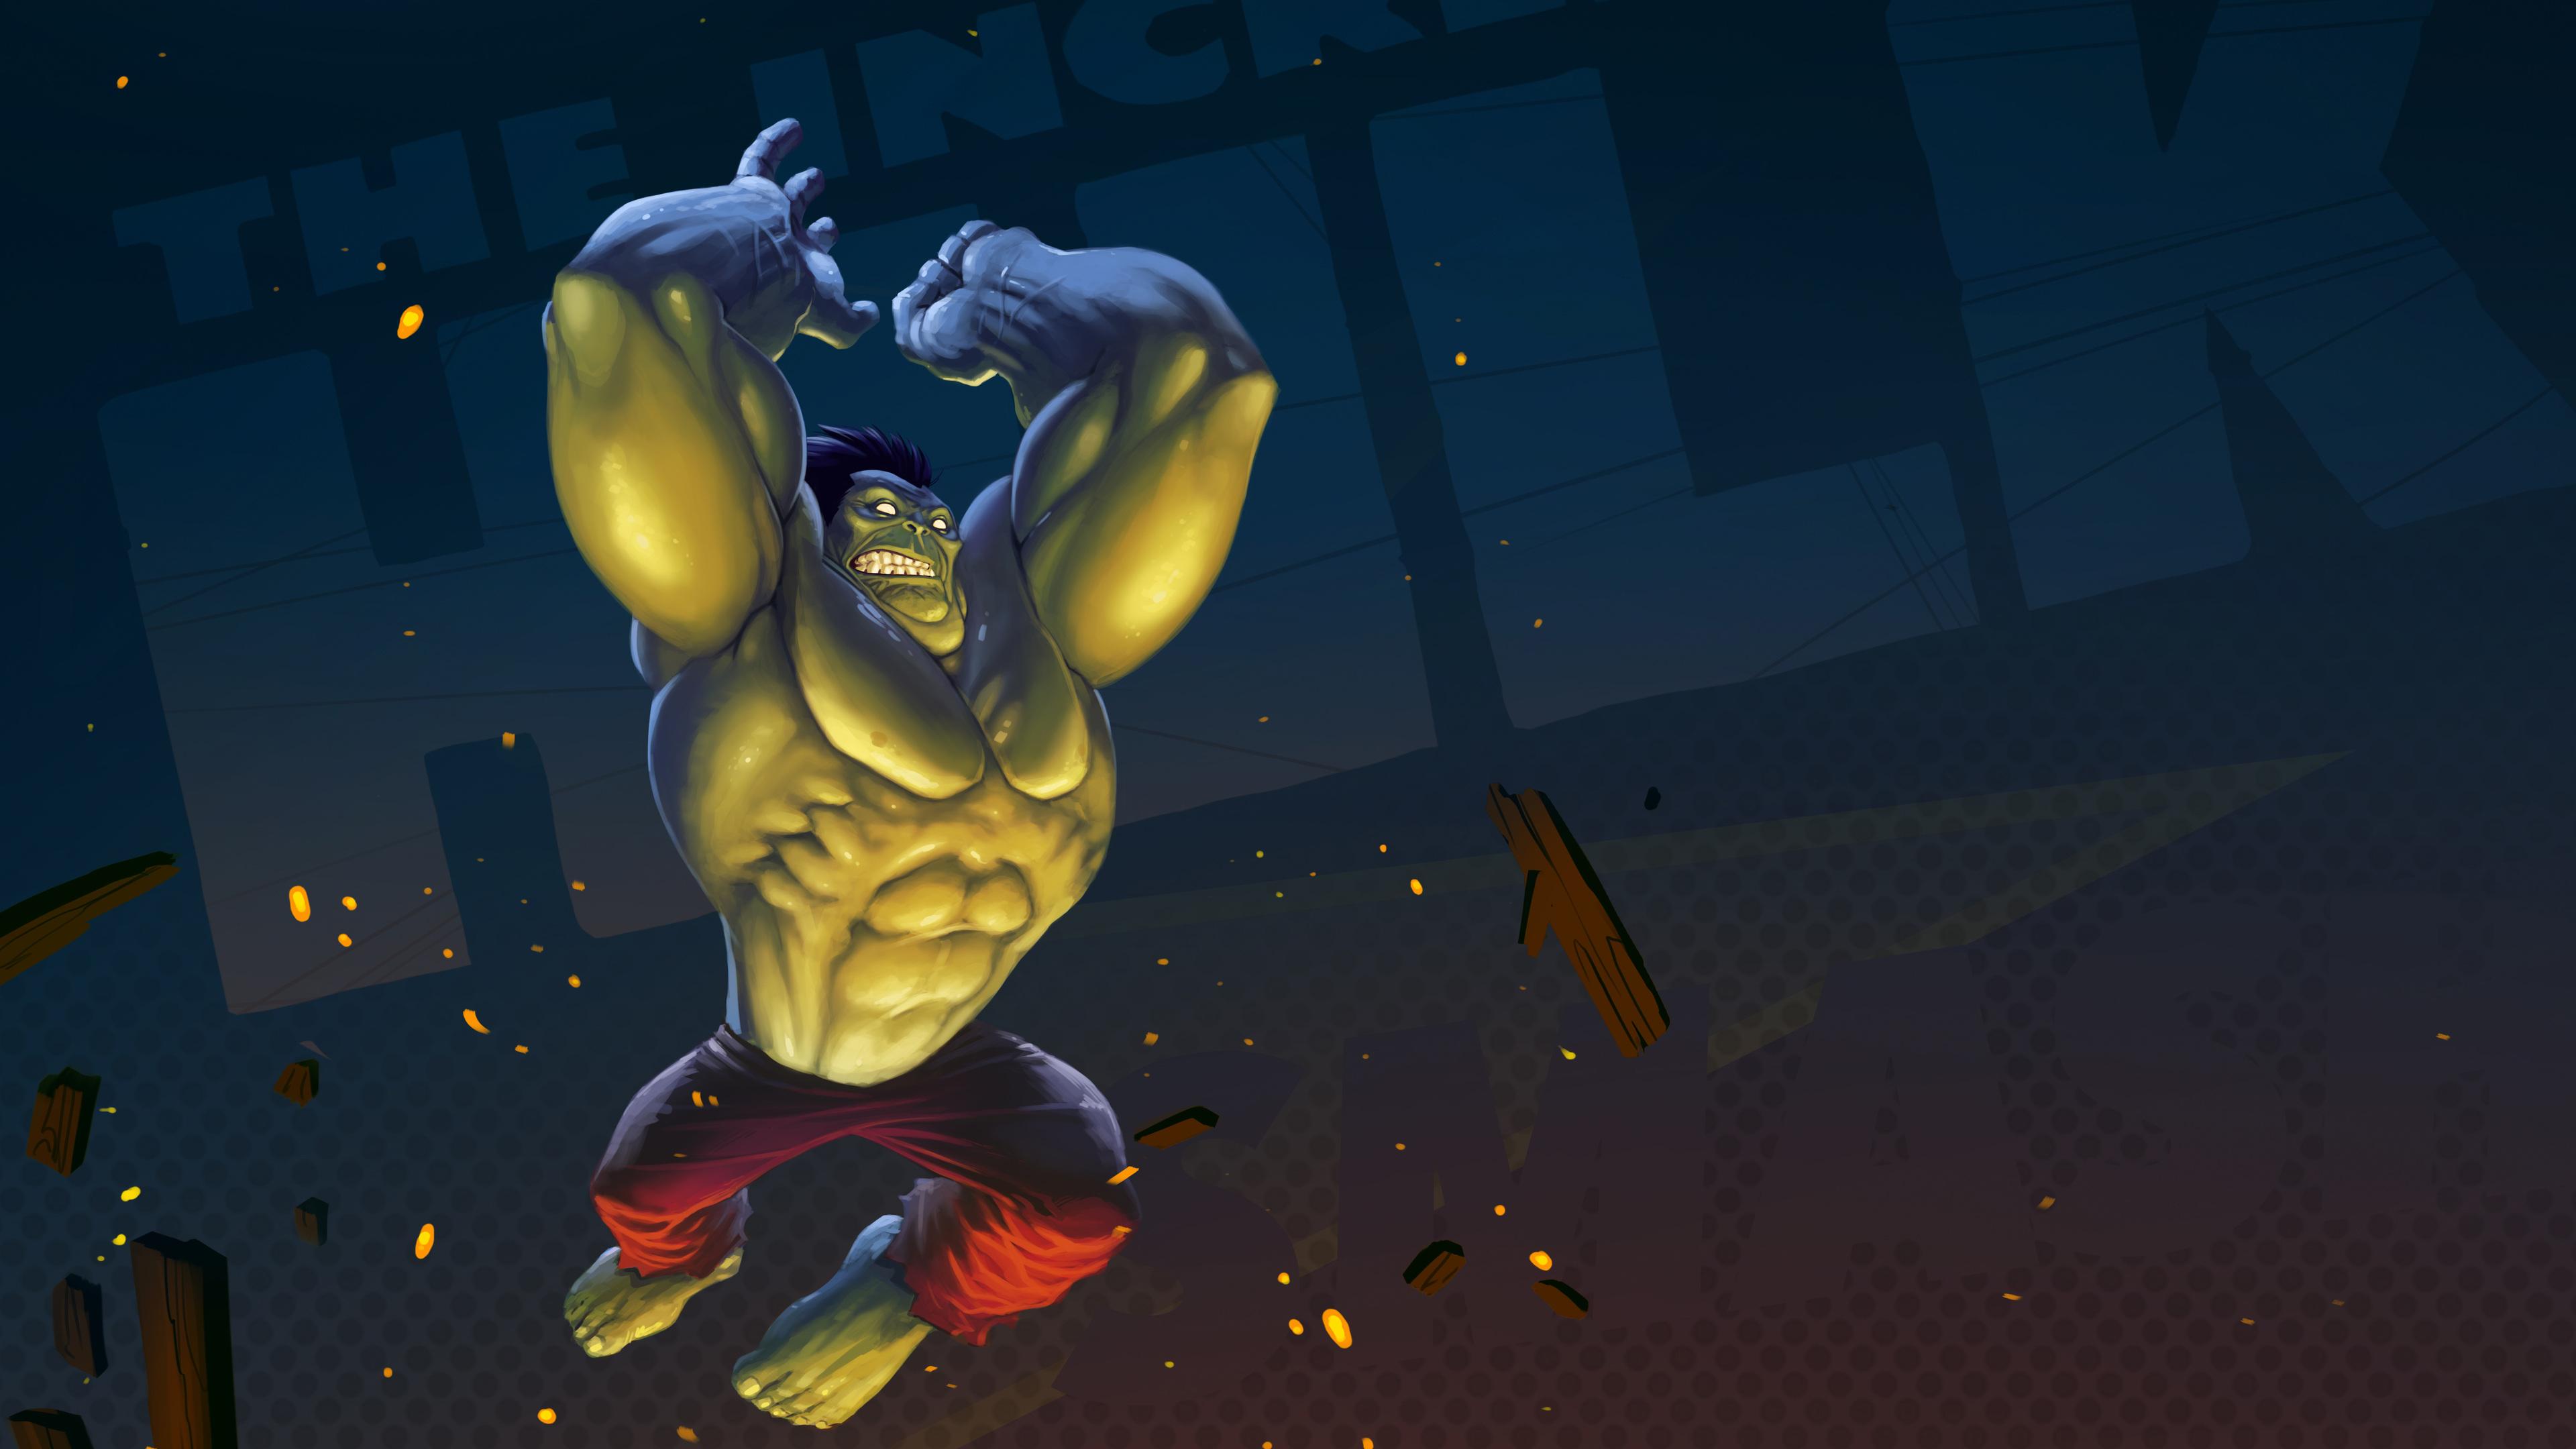 hulk artwork 5k 1536522833 - Hulk Artwork 5k - superheroes wallpapers, hulk wallpapers, hd-wallpapers, digital art wallpapers, artwork wallpapers4k wallpapers, artwork wallpapers, artist wallpapers